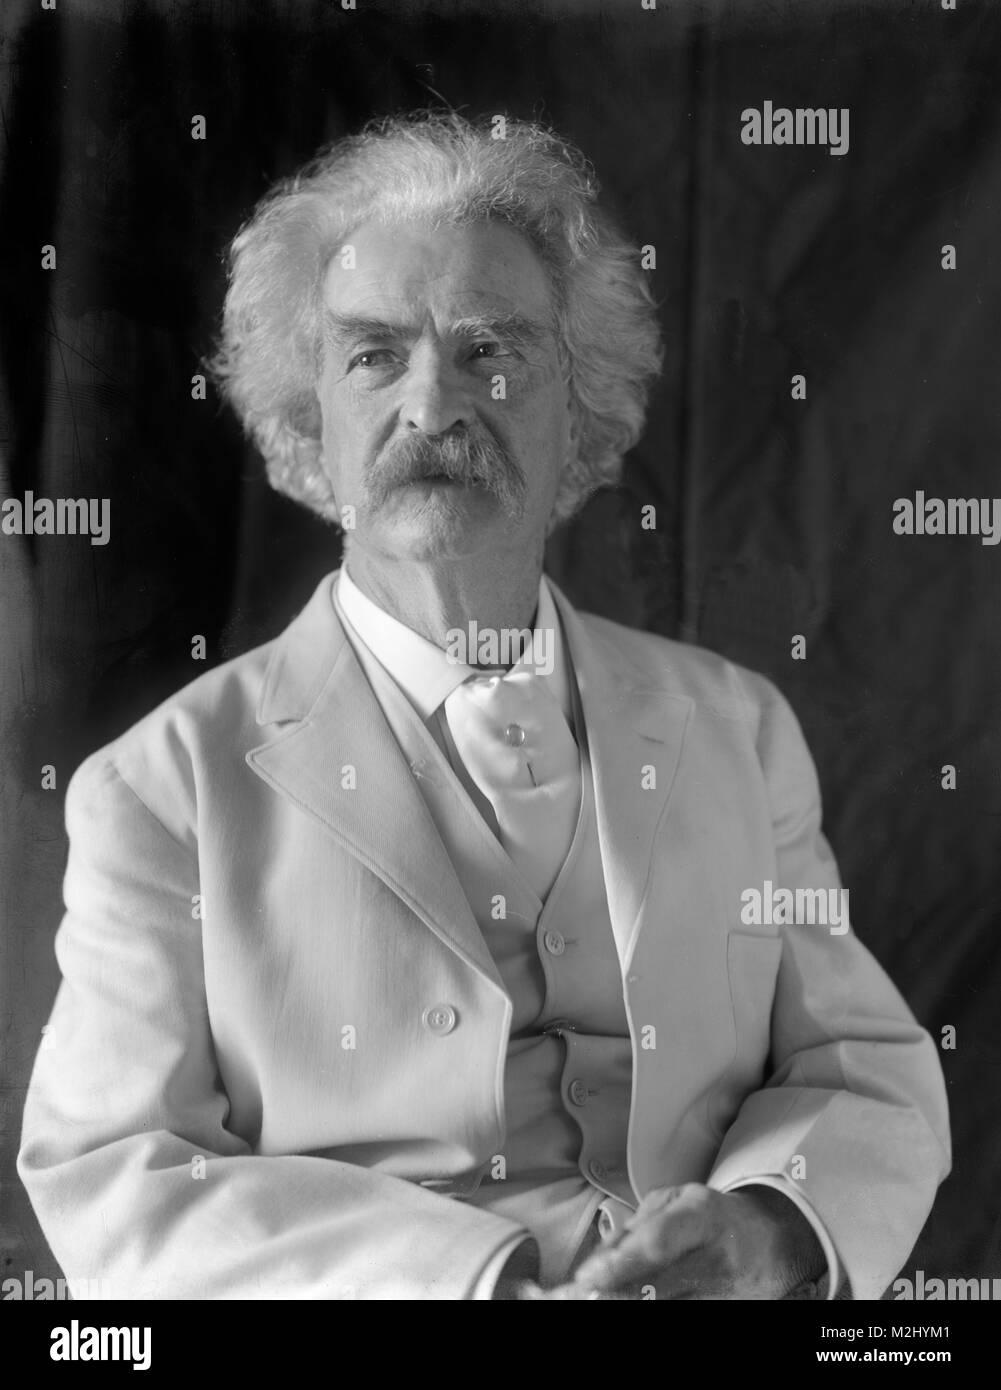 Mark Twain, American Author and Humorist - Stock Image